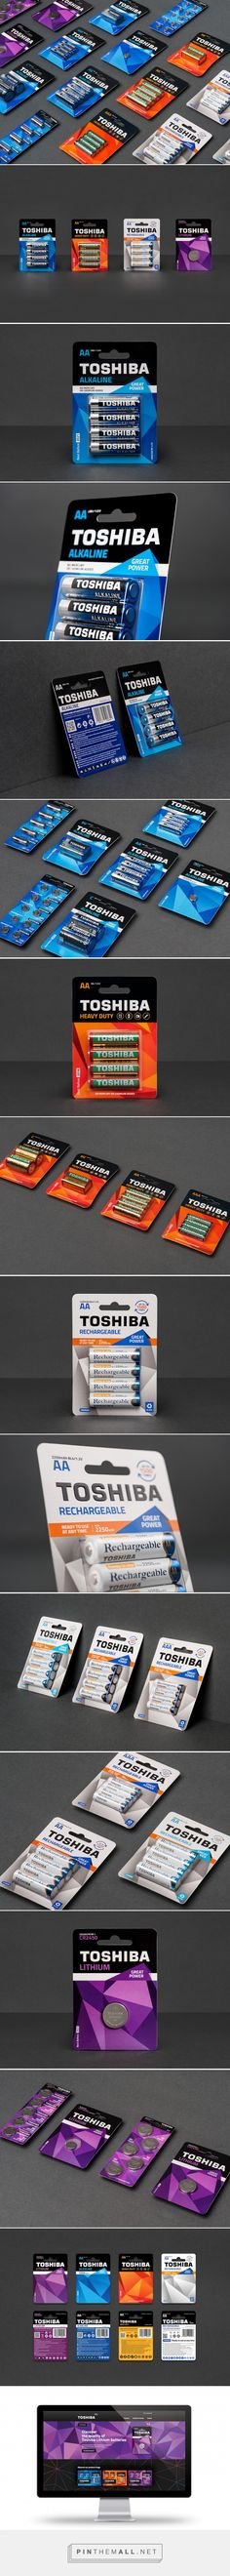 #Toshiba #Batteries For #European Market designed by NECON - http://www.packagingoftheworld.com/2015/06/toshiba-batteries-for-european-market.html